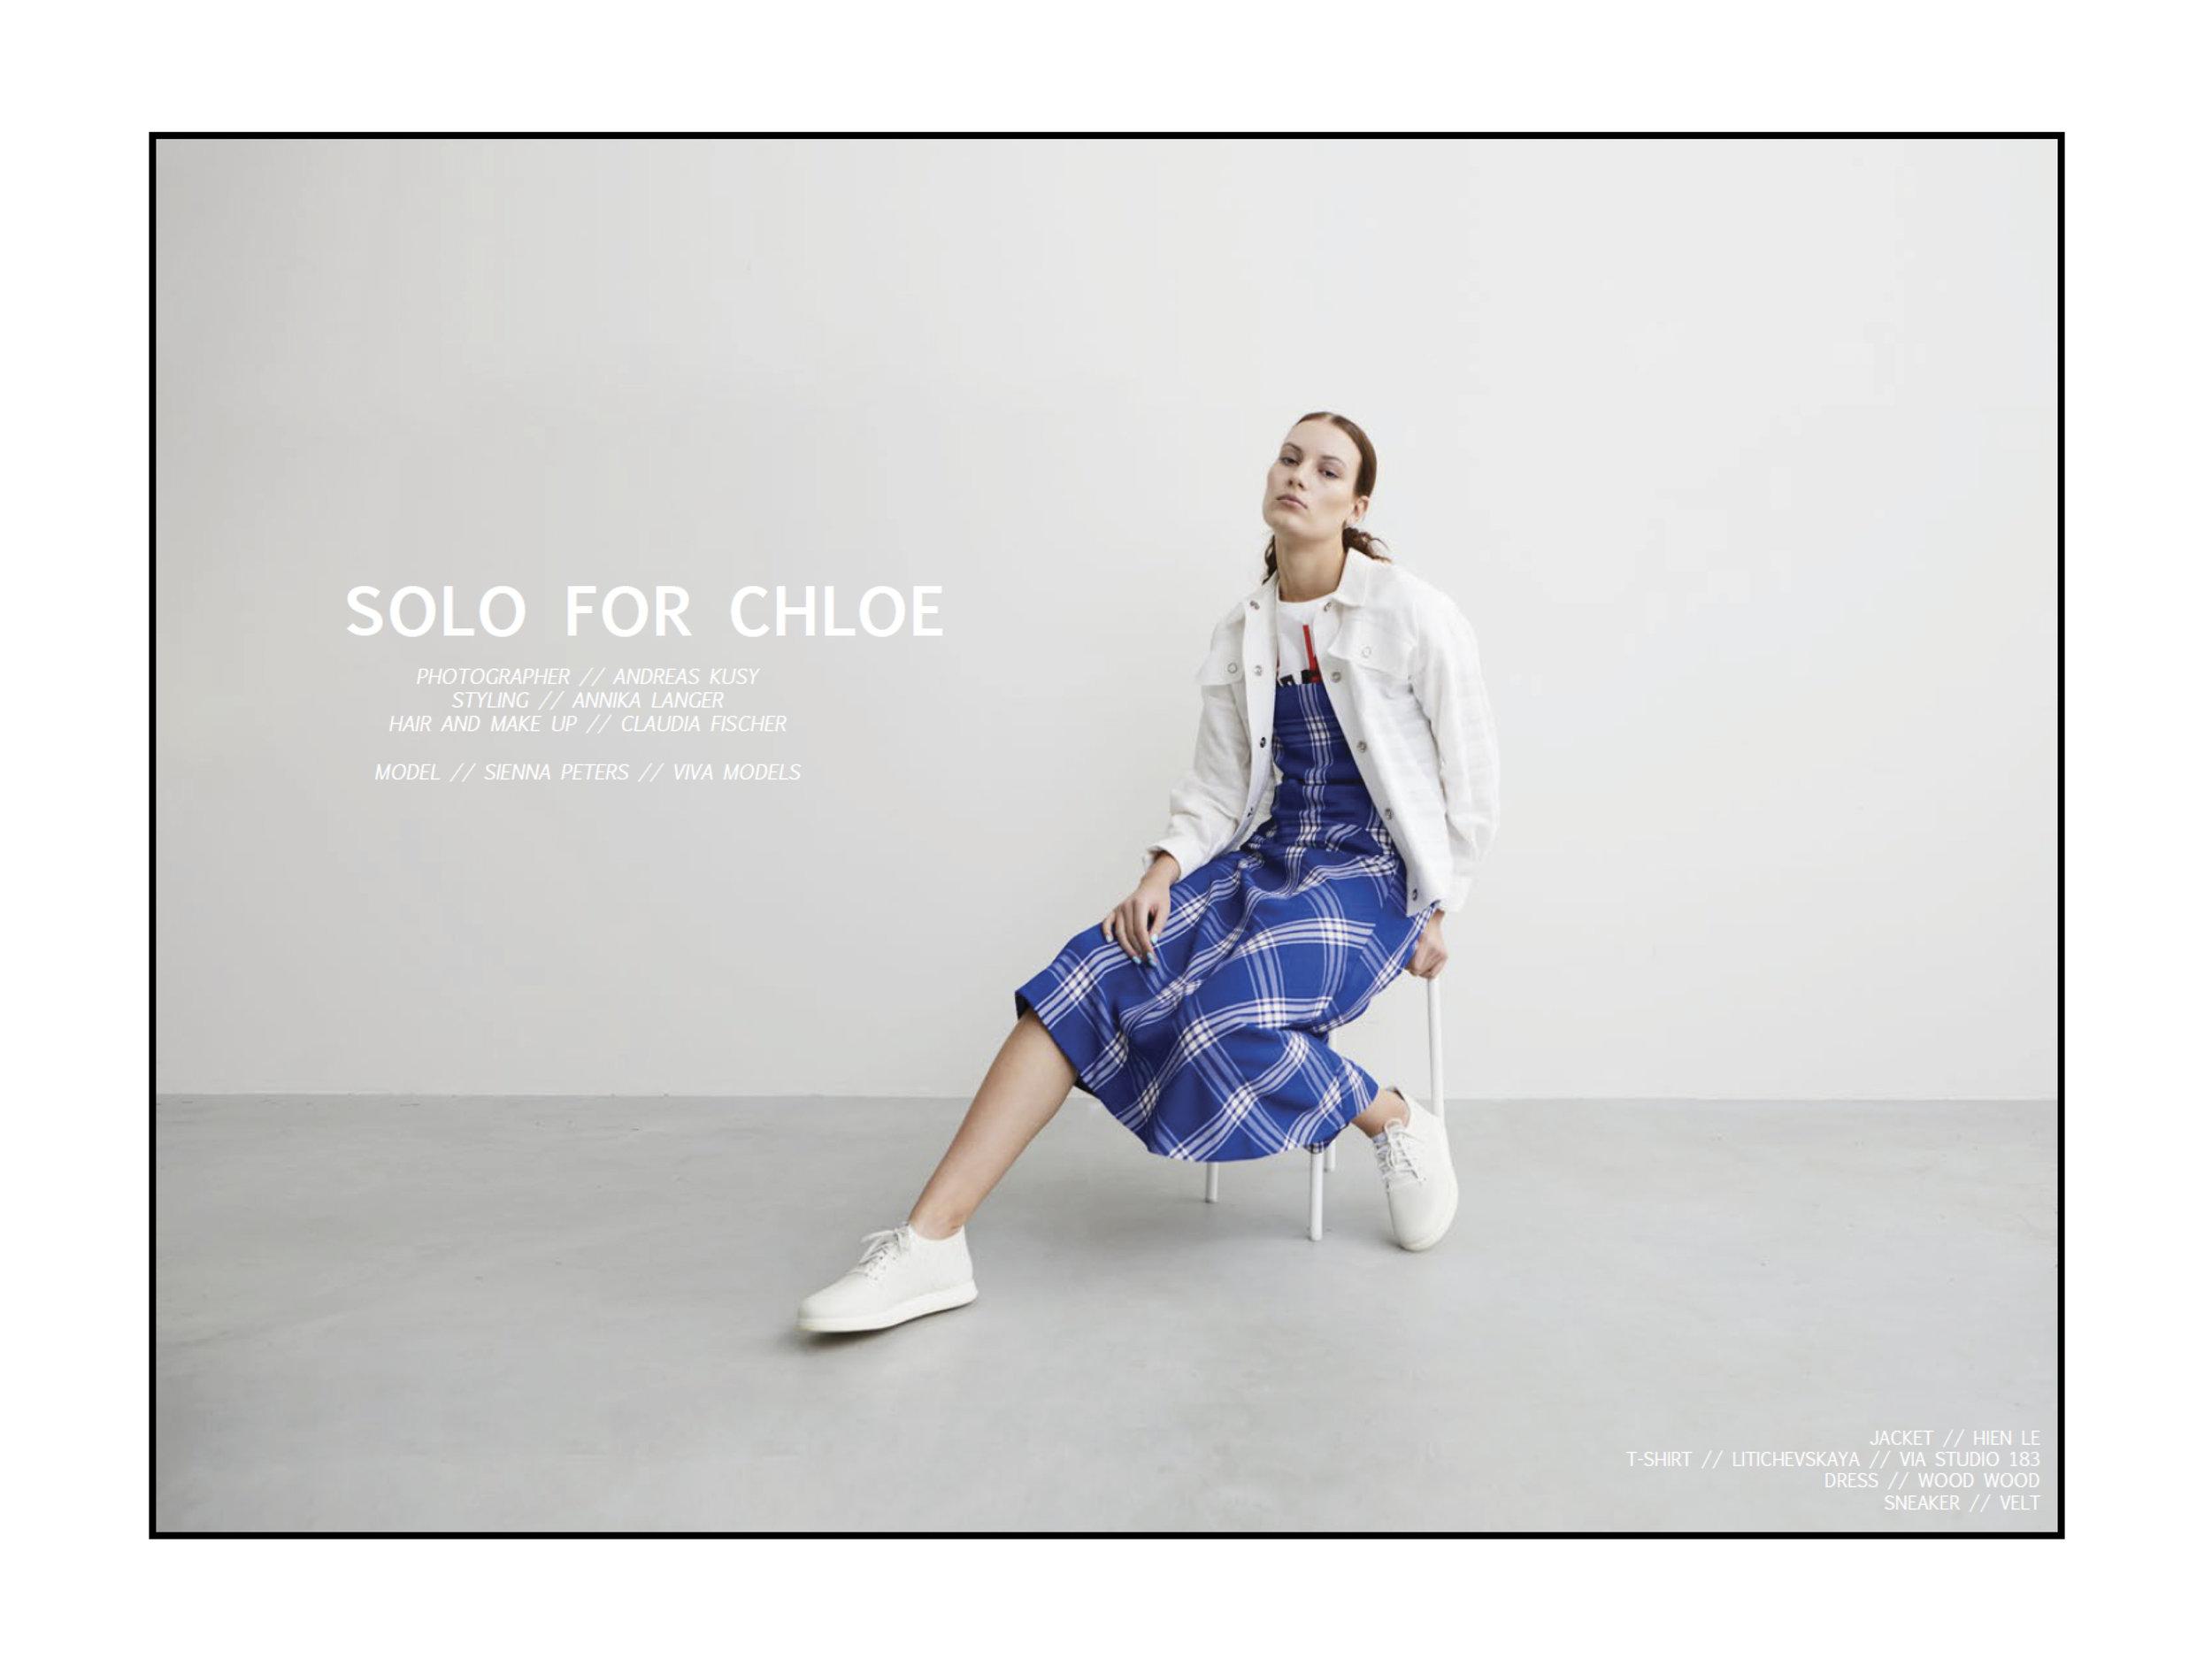 solo_for_chloe_layout.jpg